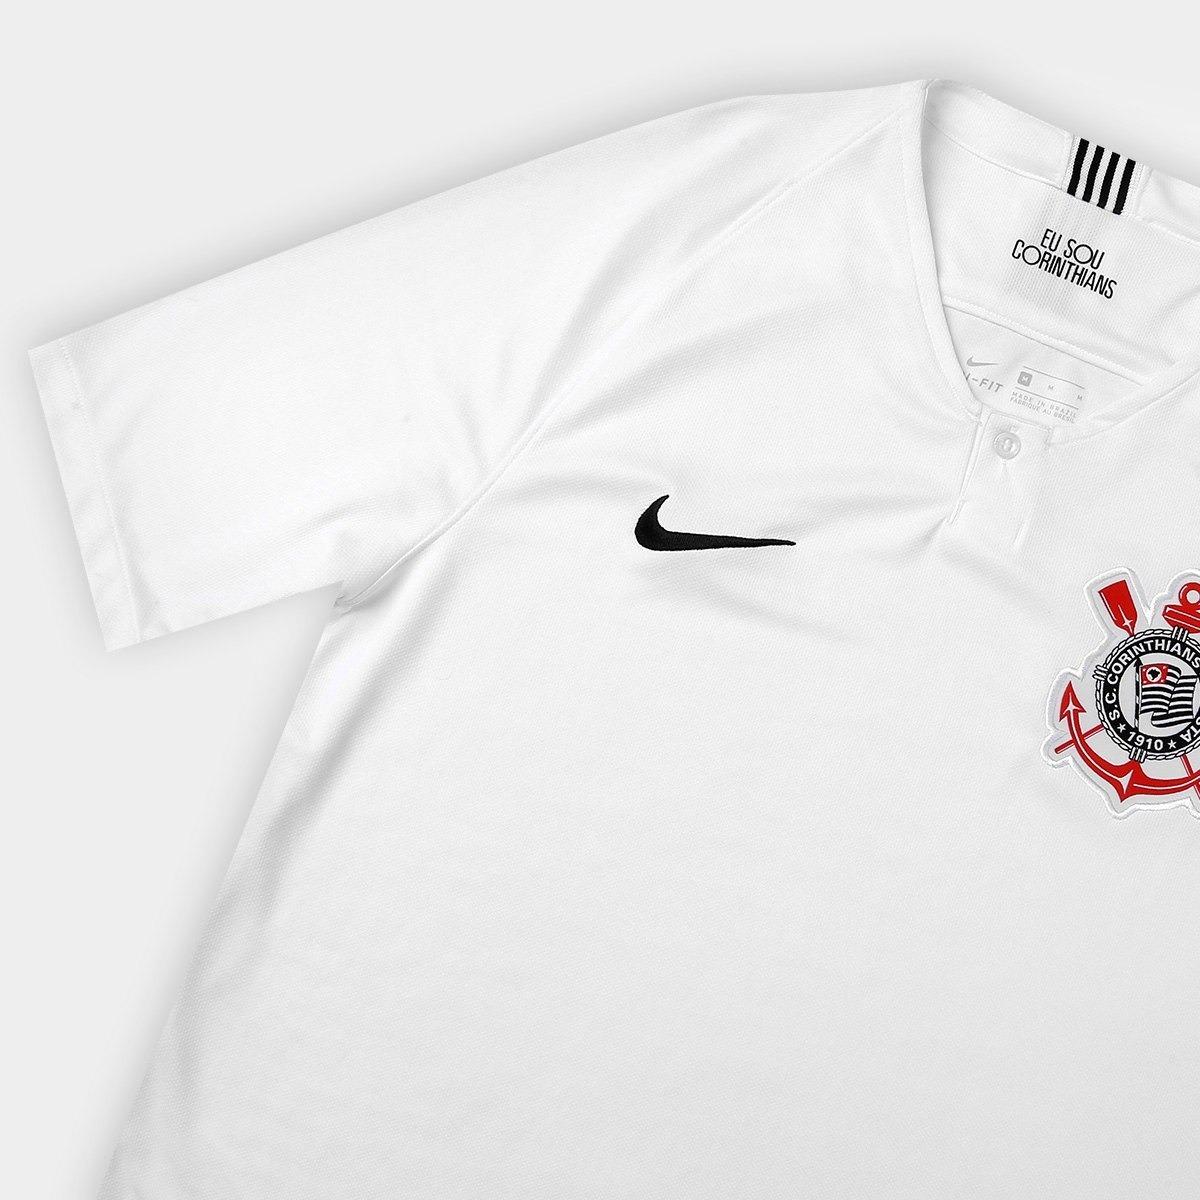 82502f029 Carregando zoom... camisa oficial nike corinthians 2018 torcedor masculina